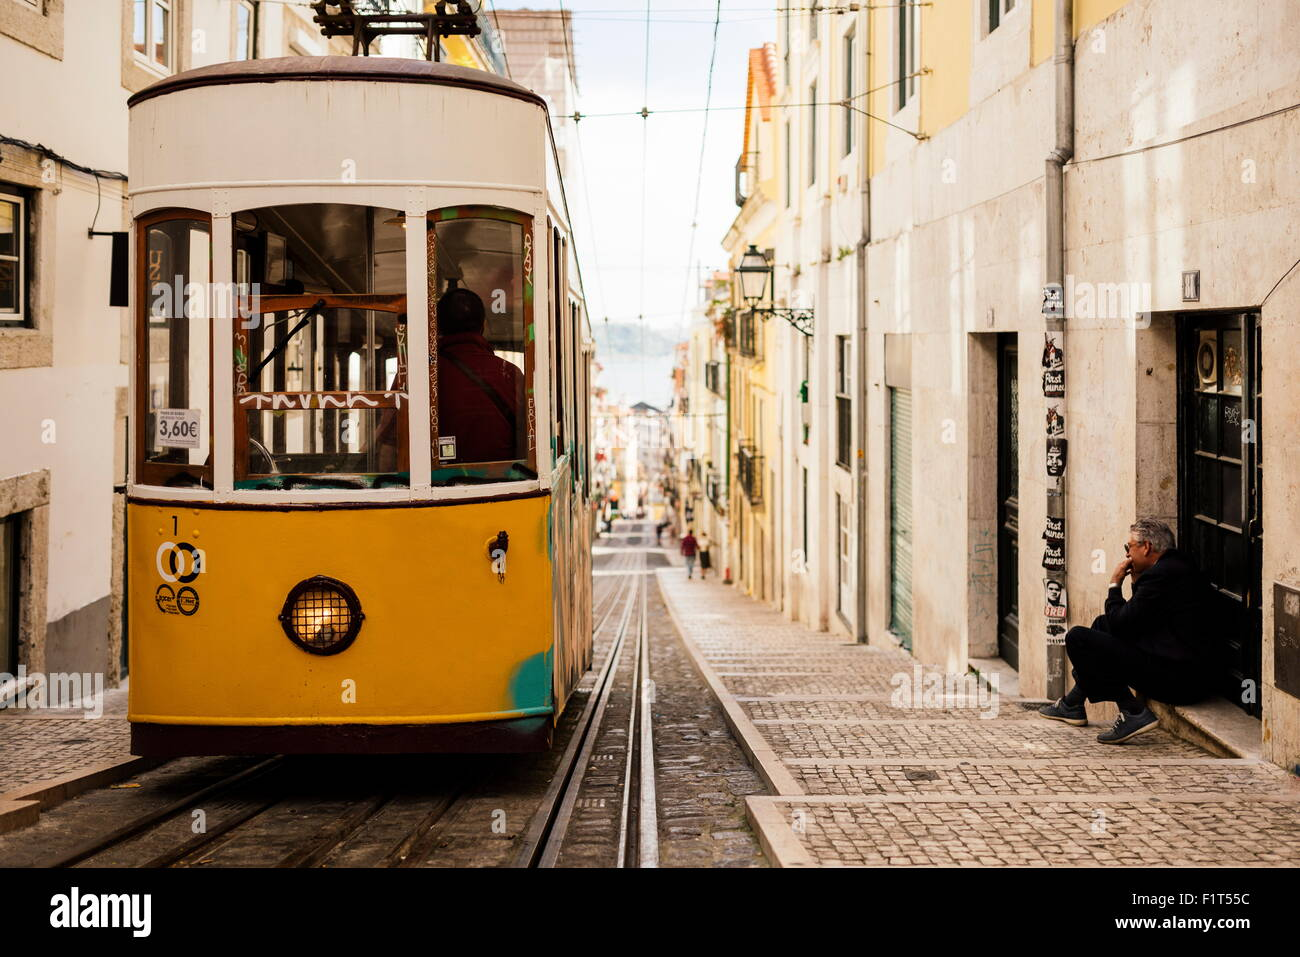 En tramway Elevador da Bica, Lisbonne, Portugal, Europe Photo Stock